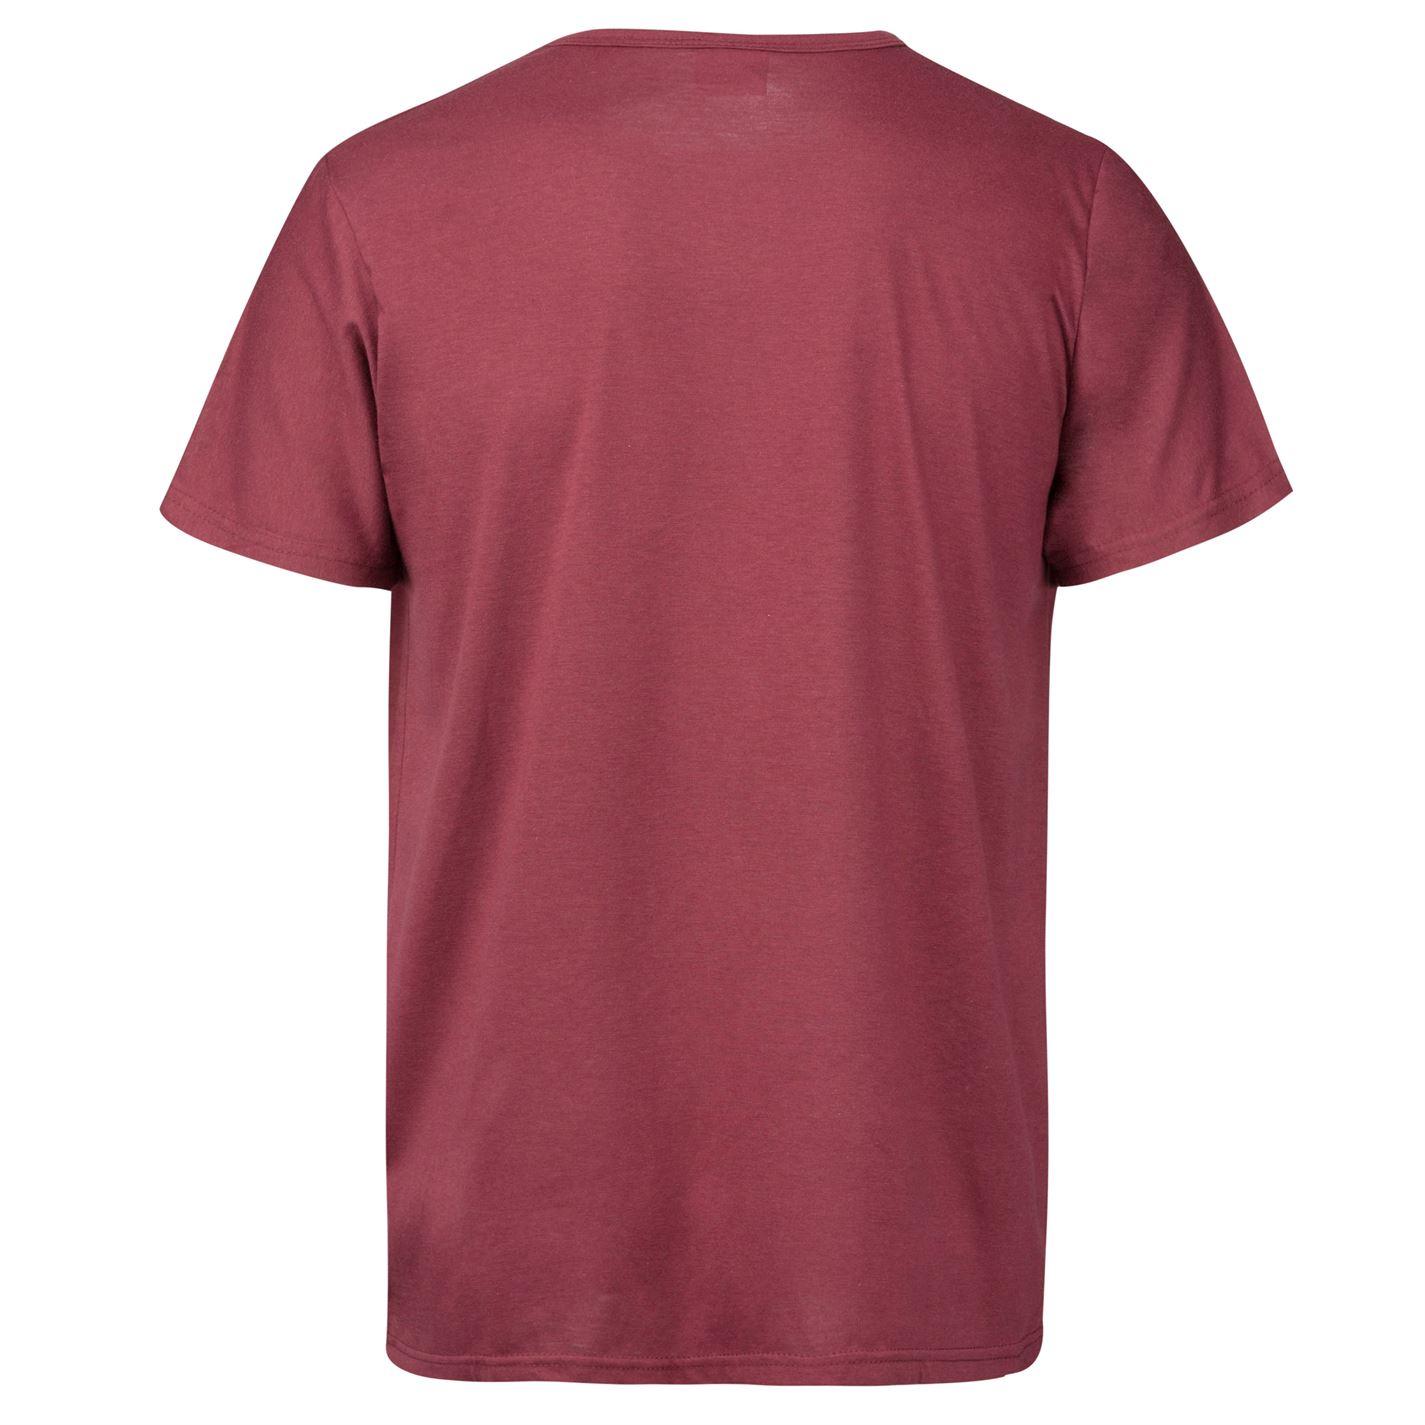 ed28f360eb7b Lee Cooper Mens Short Sleeve T Shirt Crew Neck Tee Top | eBay